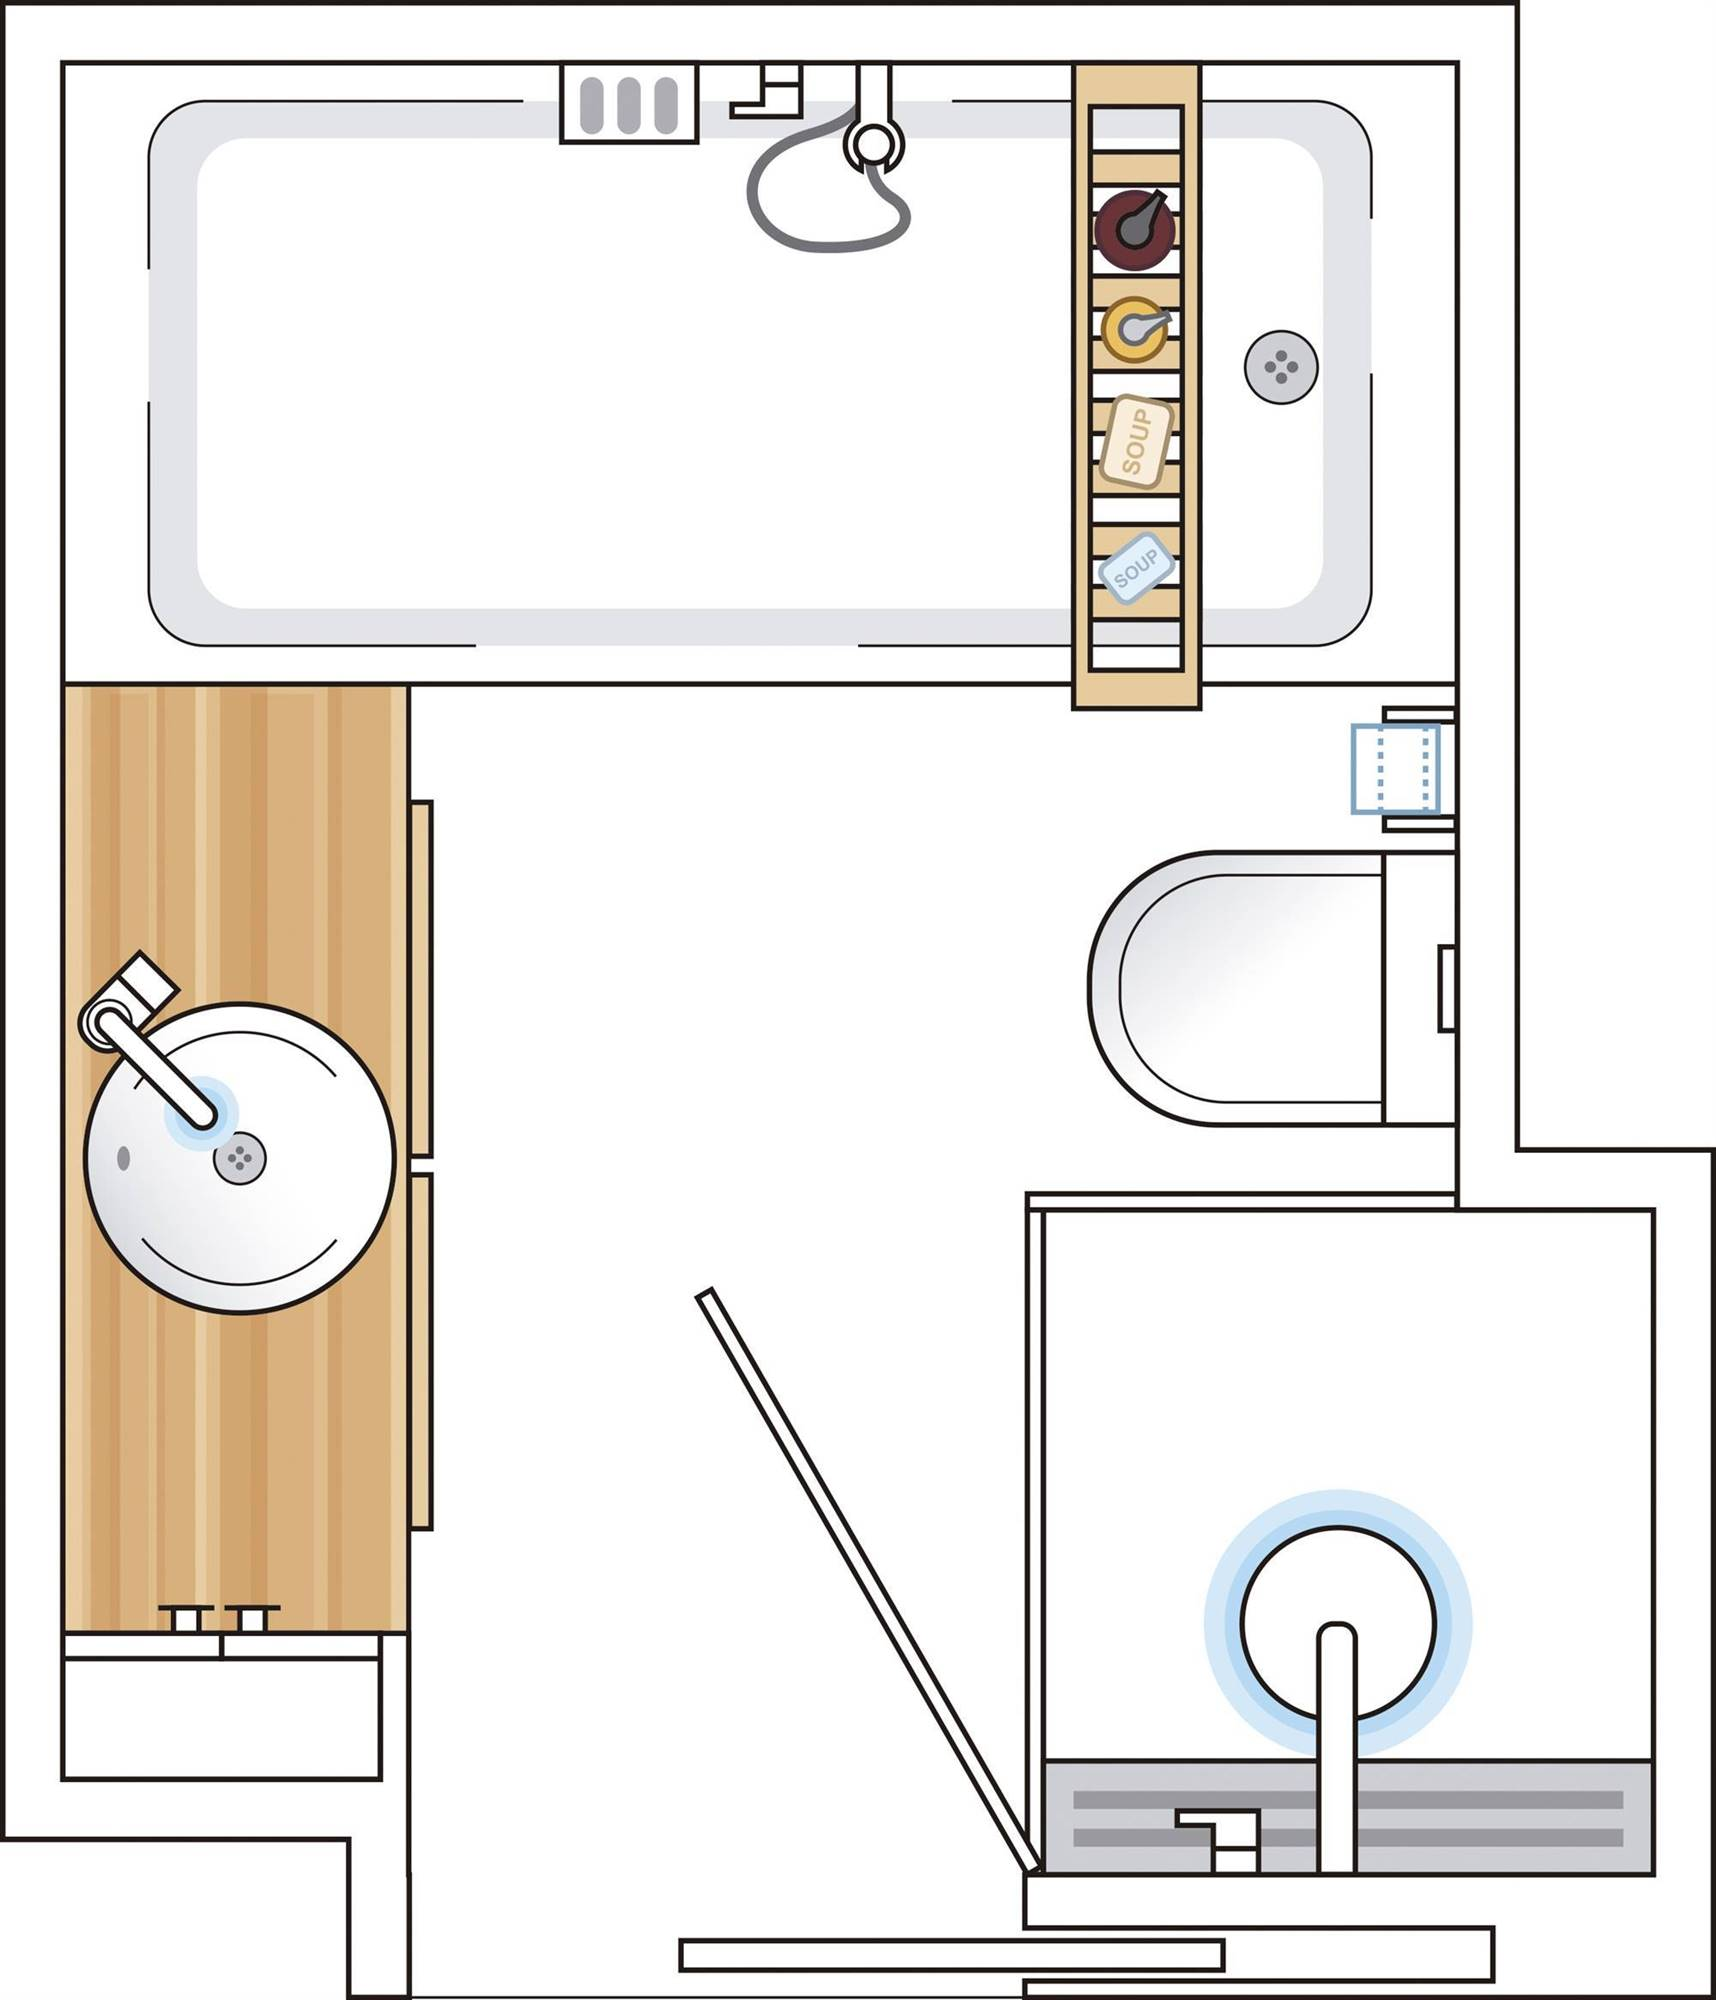 Attic bathroom plan of less than 6 m2 00498687. With shower and bathtub